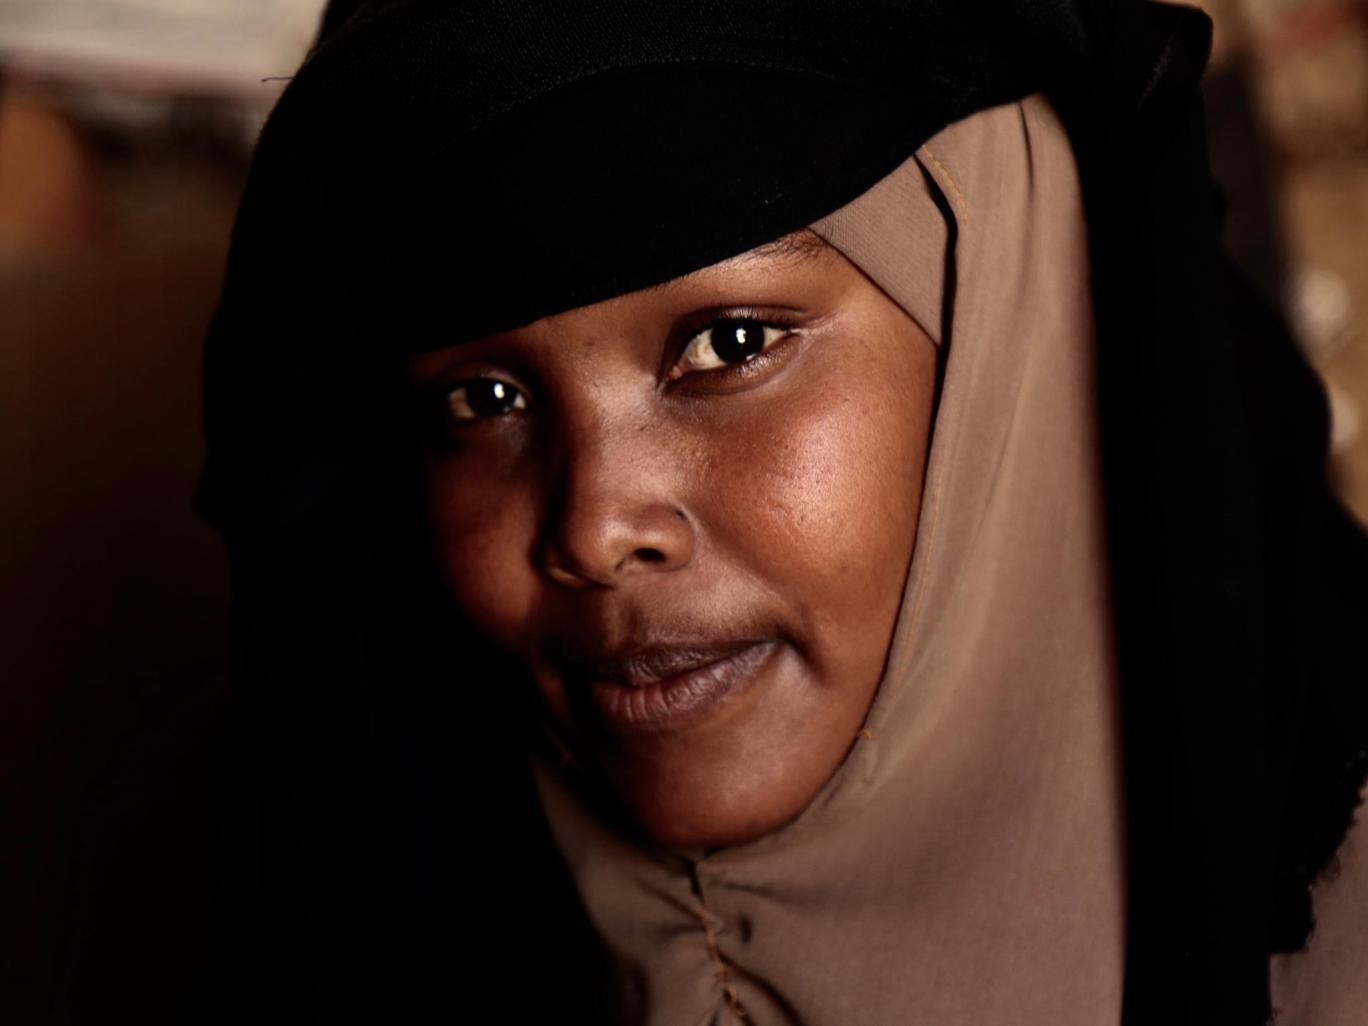 Redtube somali women s, woman fucks reptiles